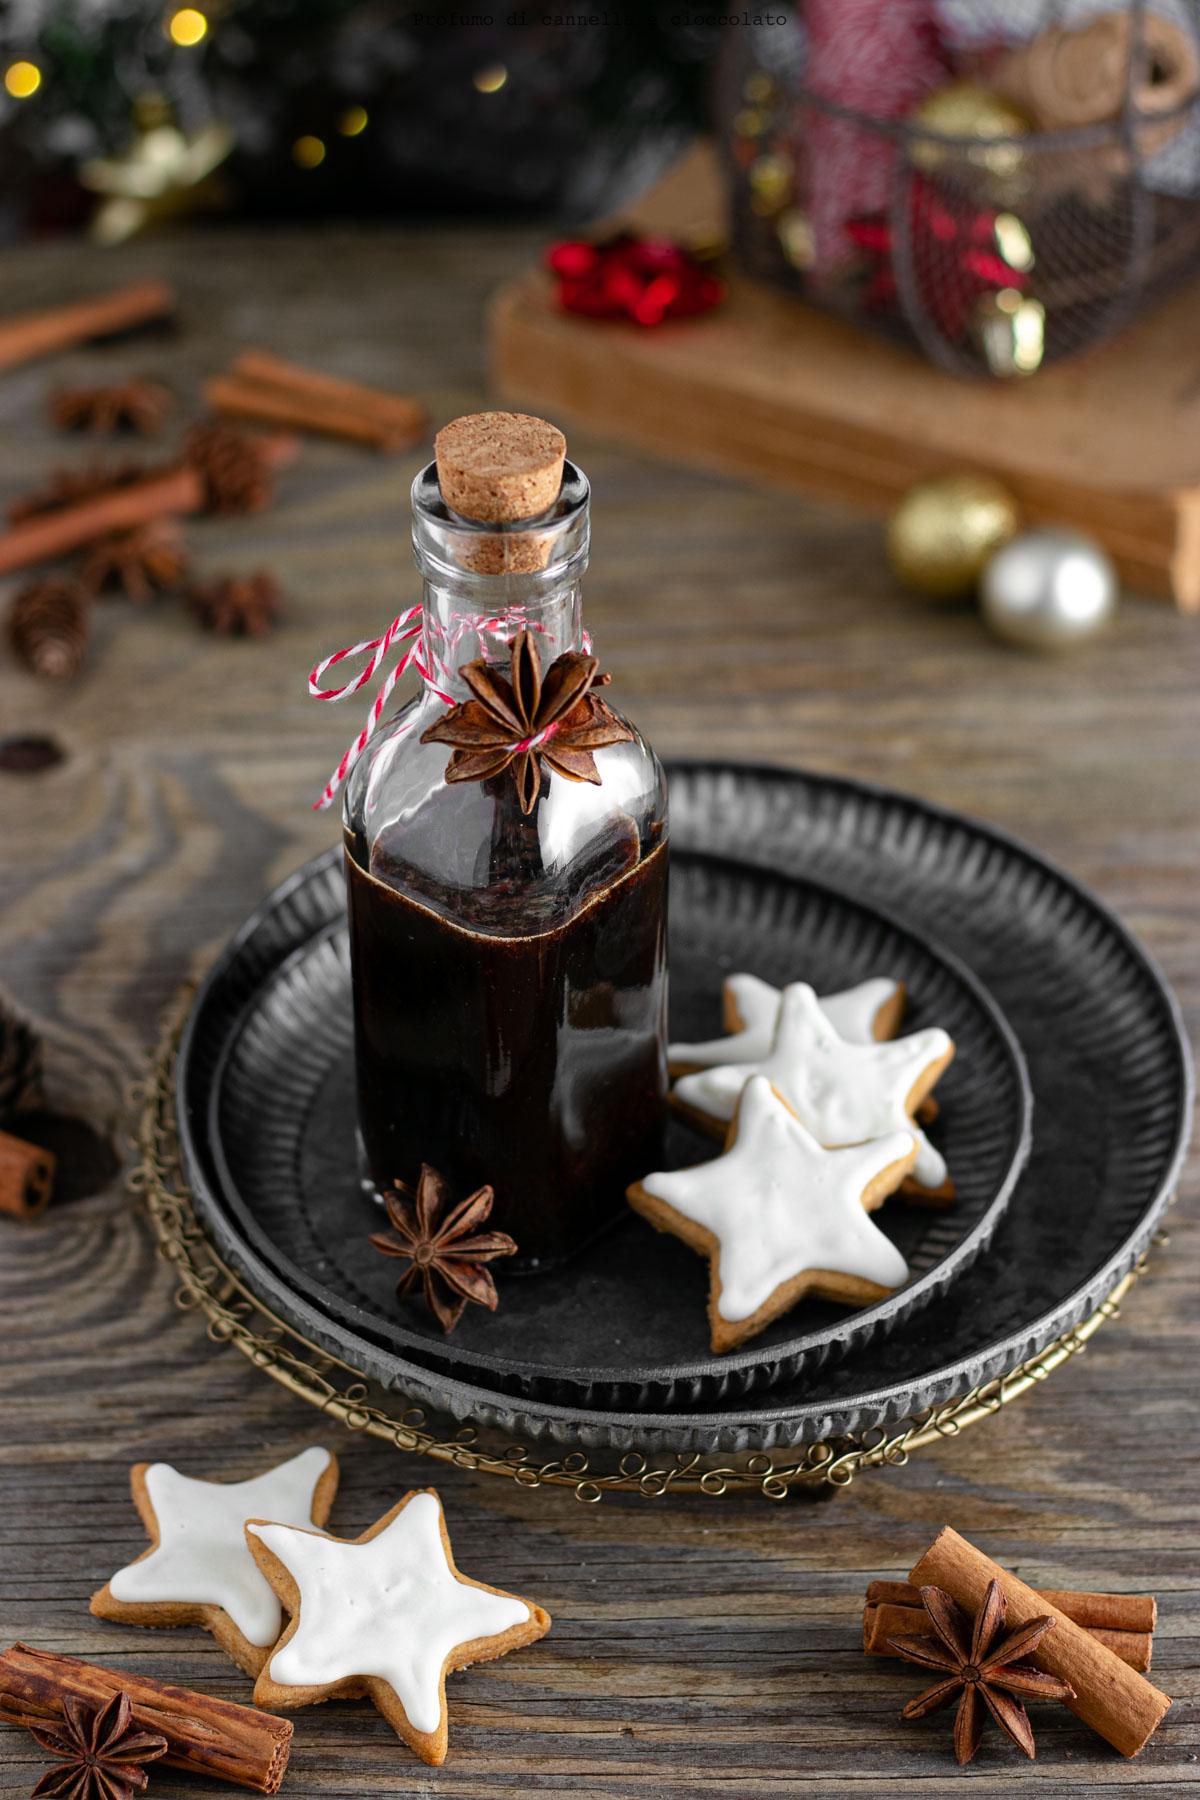 Sciroppo gingerbread